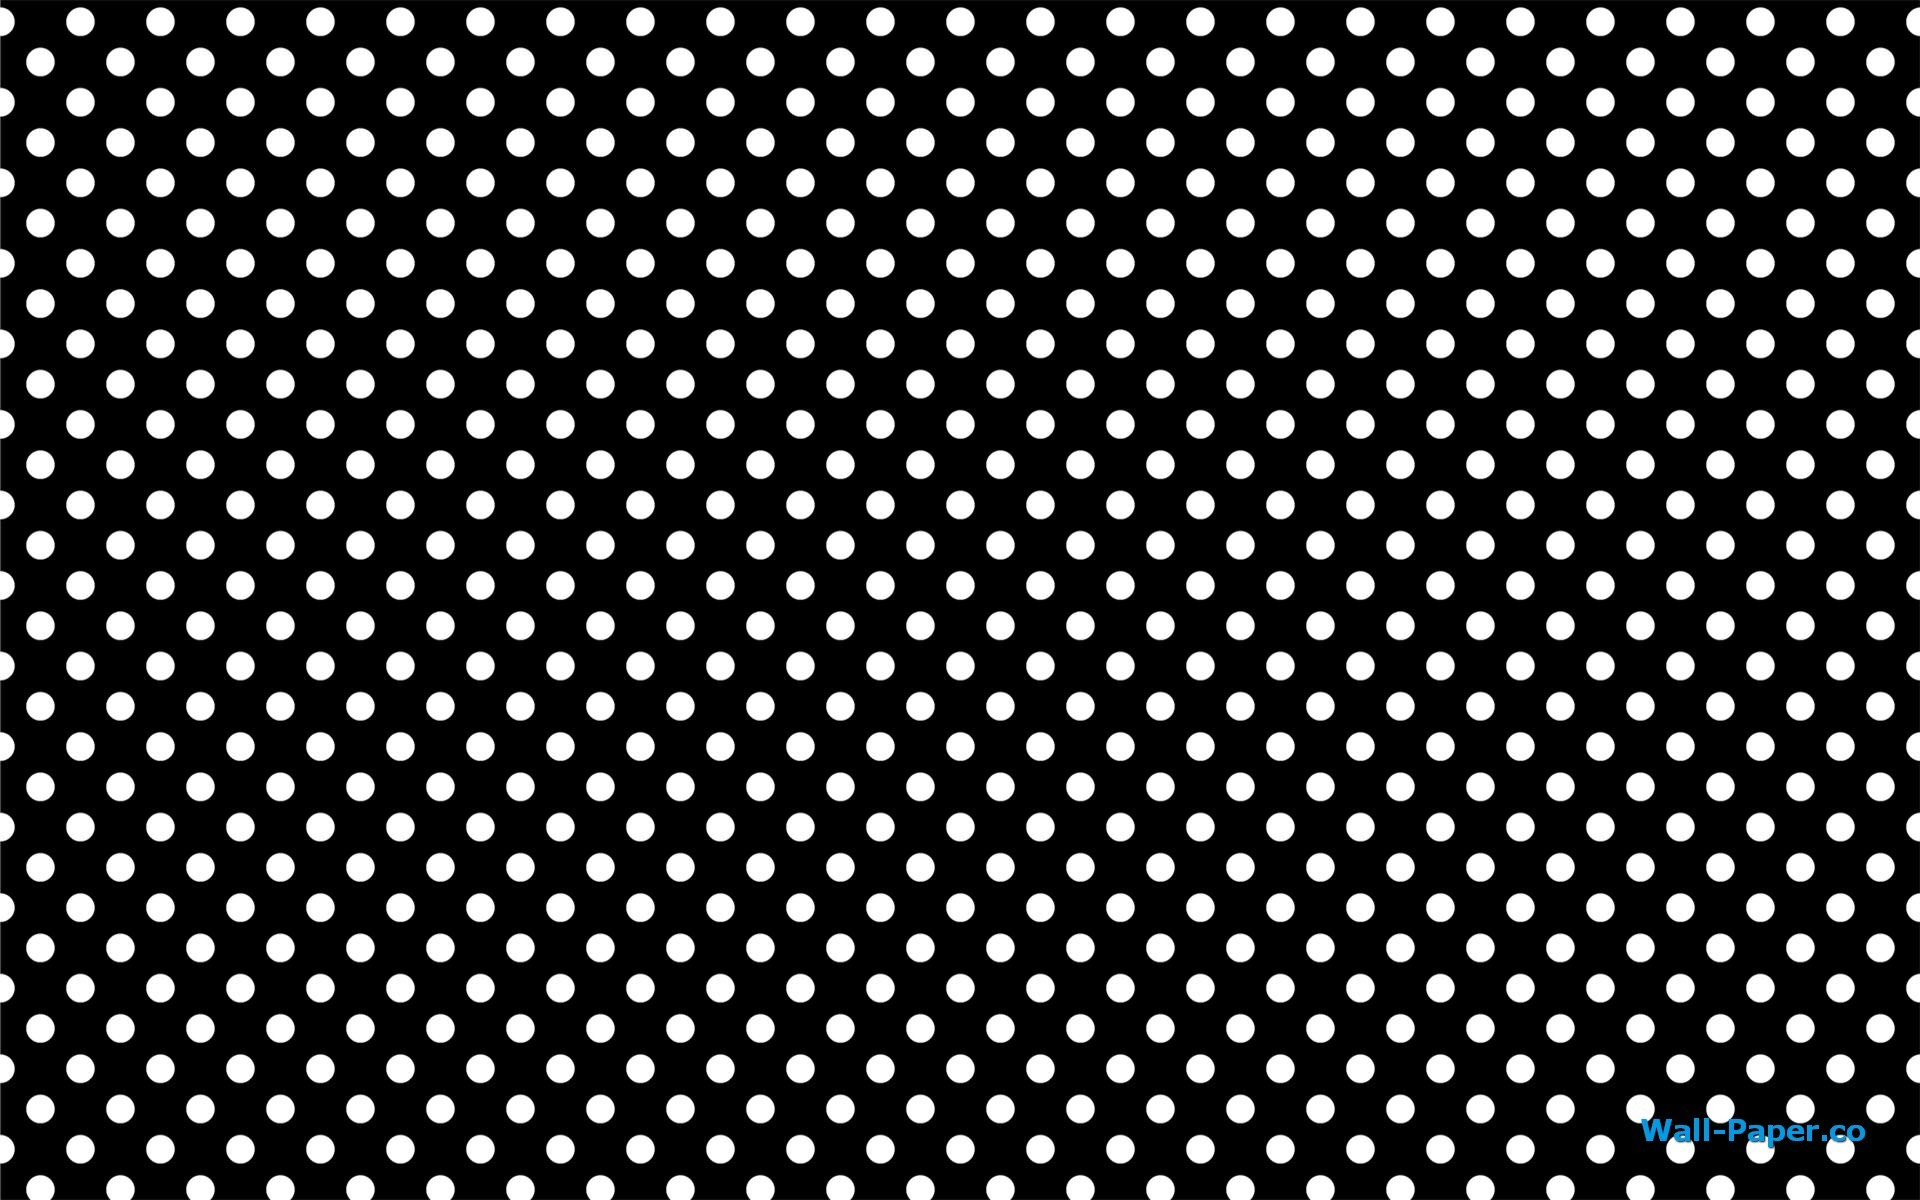 White Dots On Black Background Hd Wallpaper | Wallpaper List